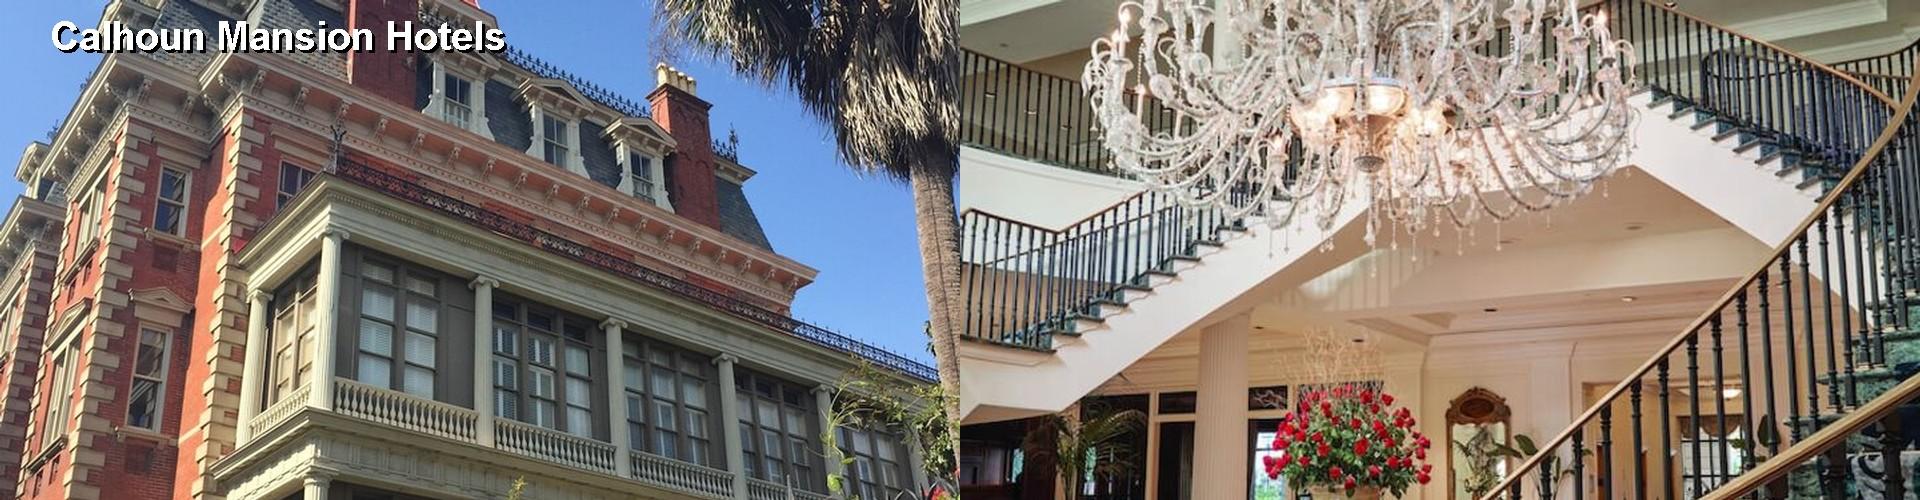 5 Best Hotels Near Calhoun Mansion